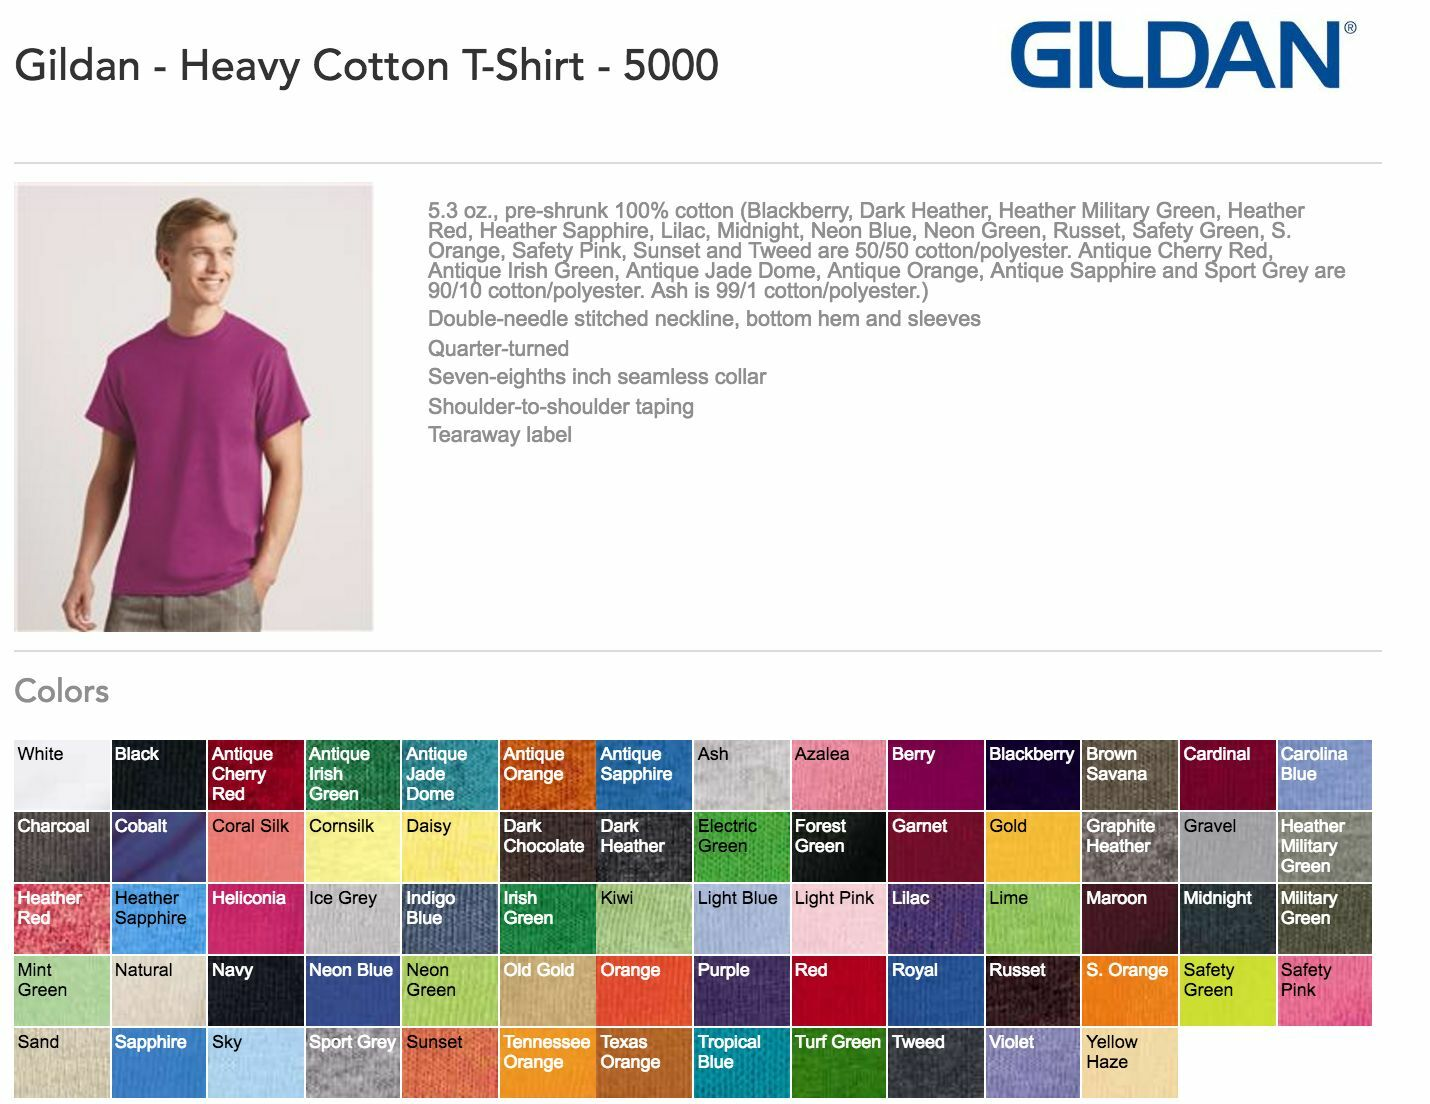 100 Gildan T-SHIRTS BLANK BULK LOTS Farbes or 108 Weiß Plain S-XL Wholesale 50